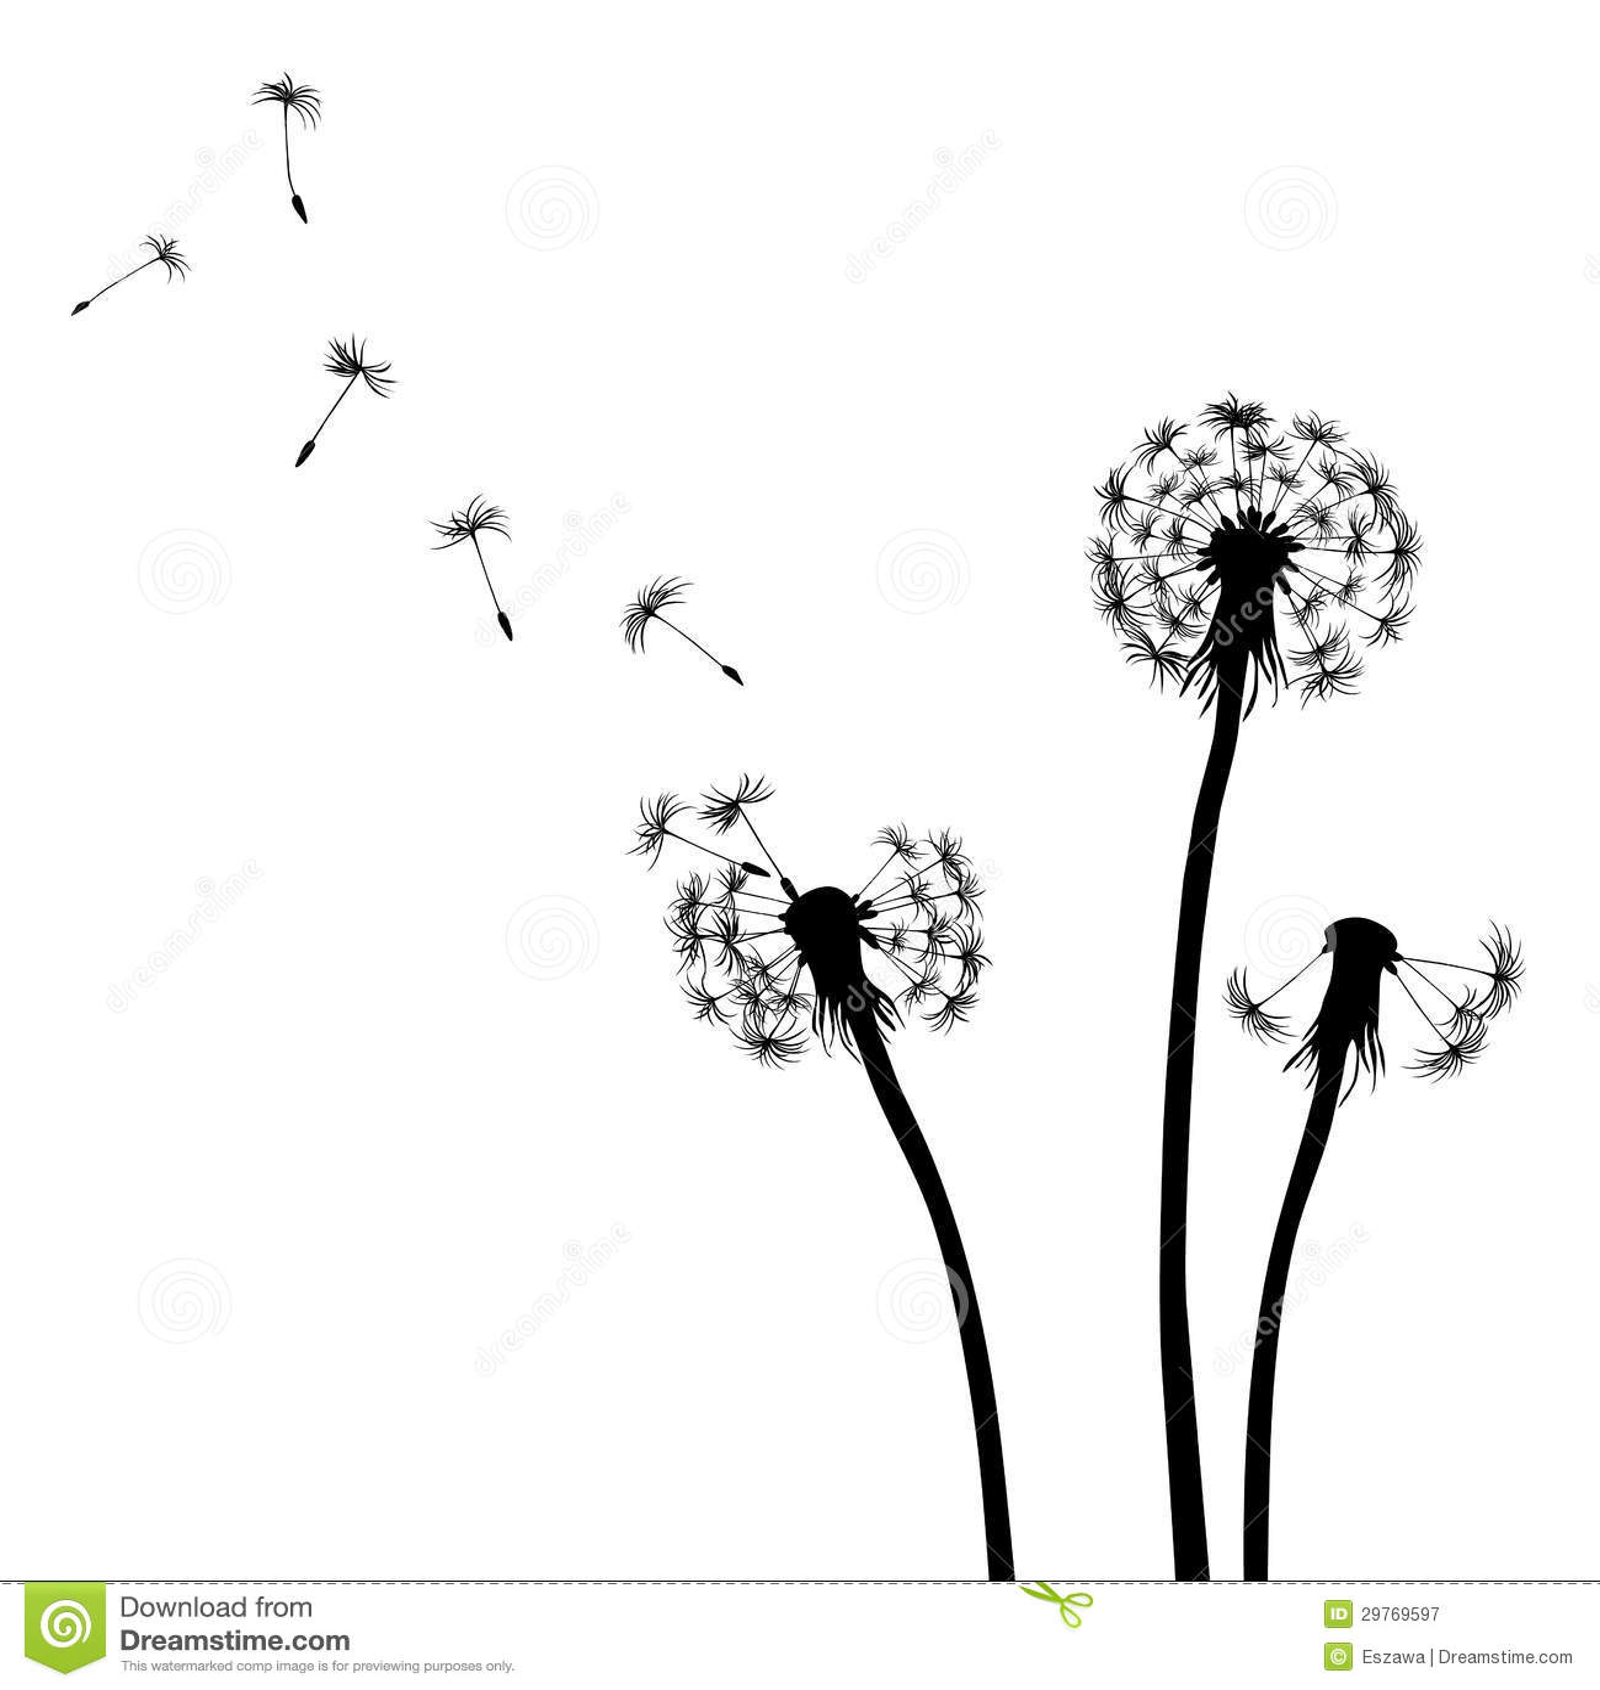 Black Flower Free Vector Download 16 295 Free Vector For: Floral Background, Dandelion Stock Vector